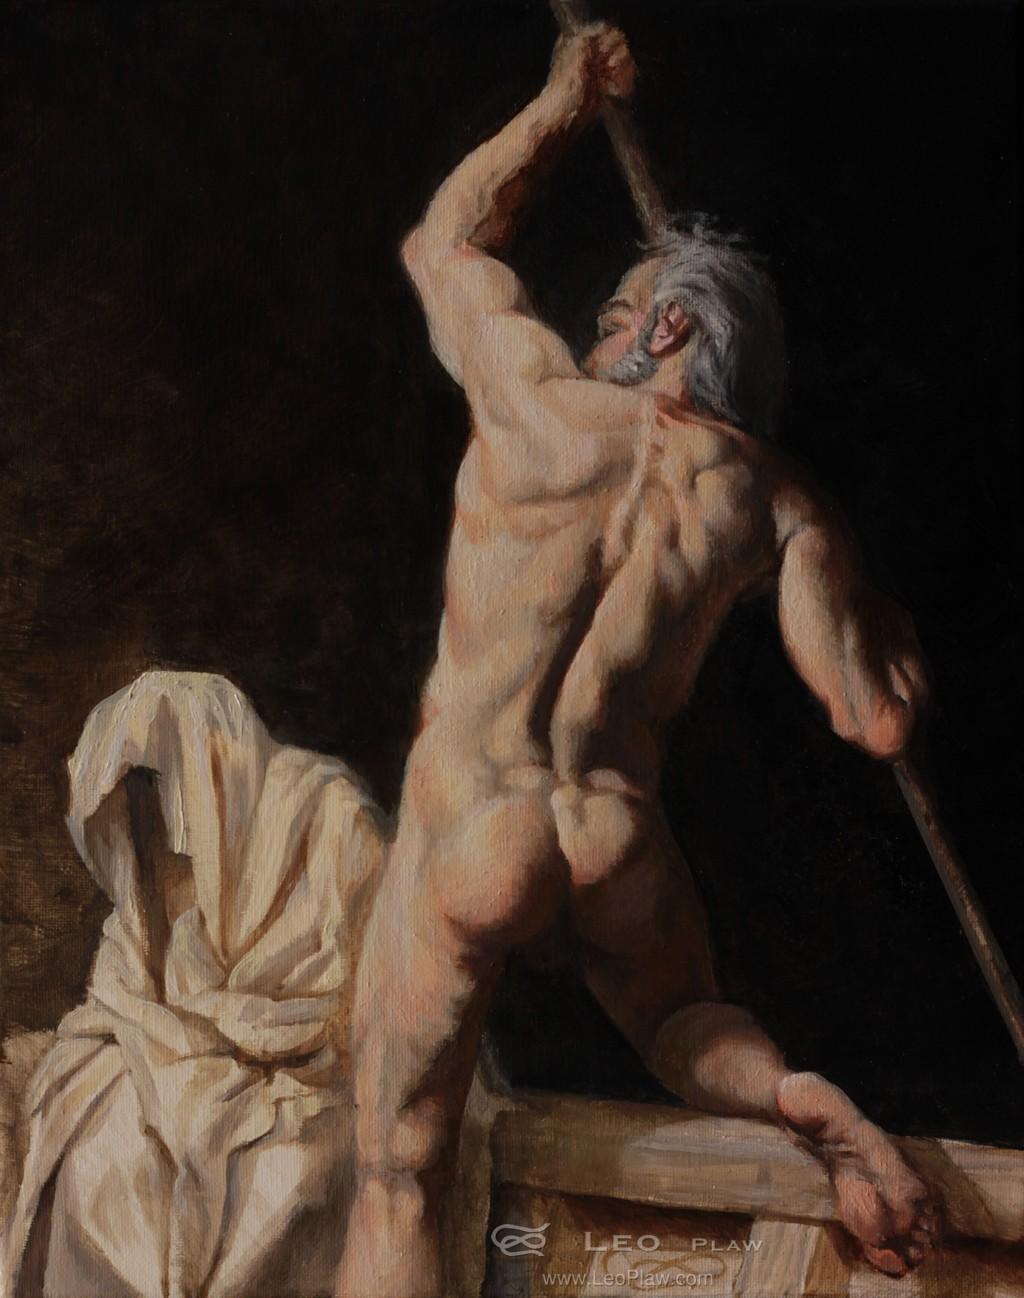 """Charon - the Ferryman"", Leo Plaw, 24 x 30cm, oil on canvas"